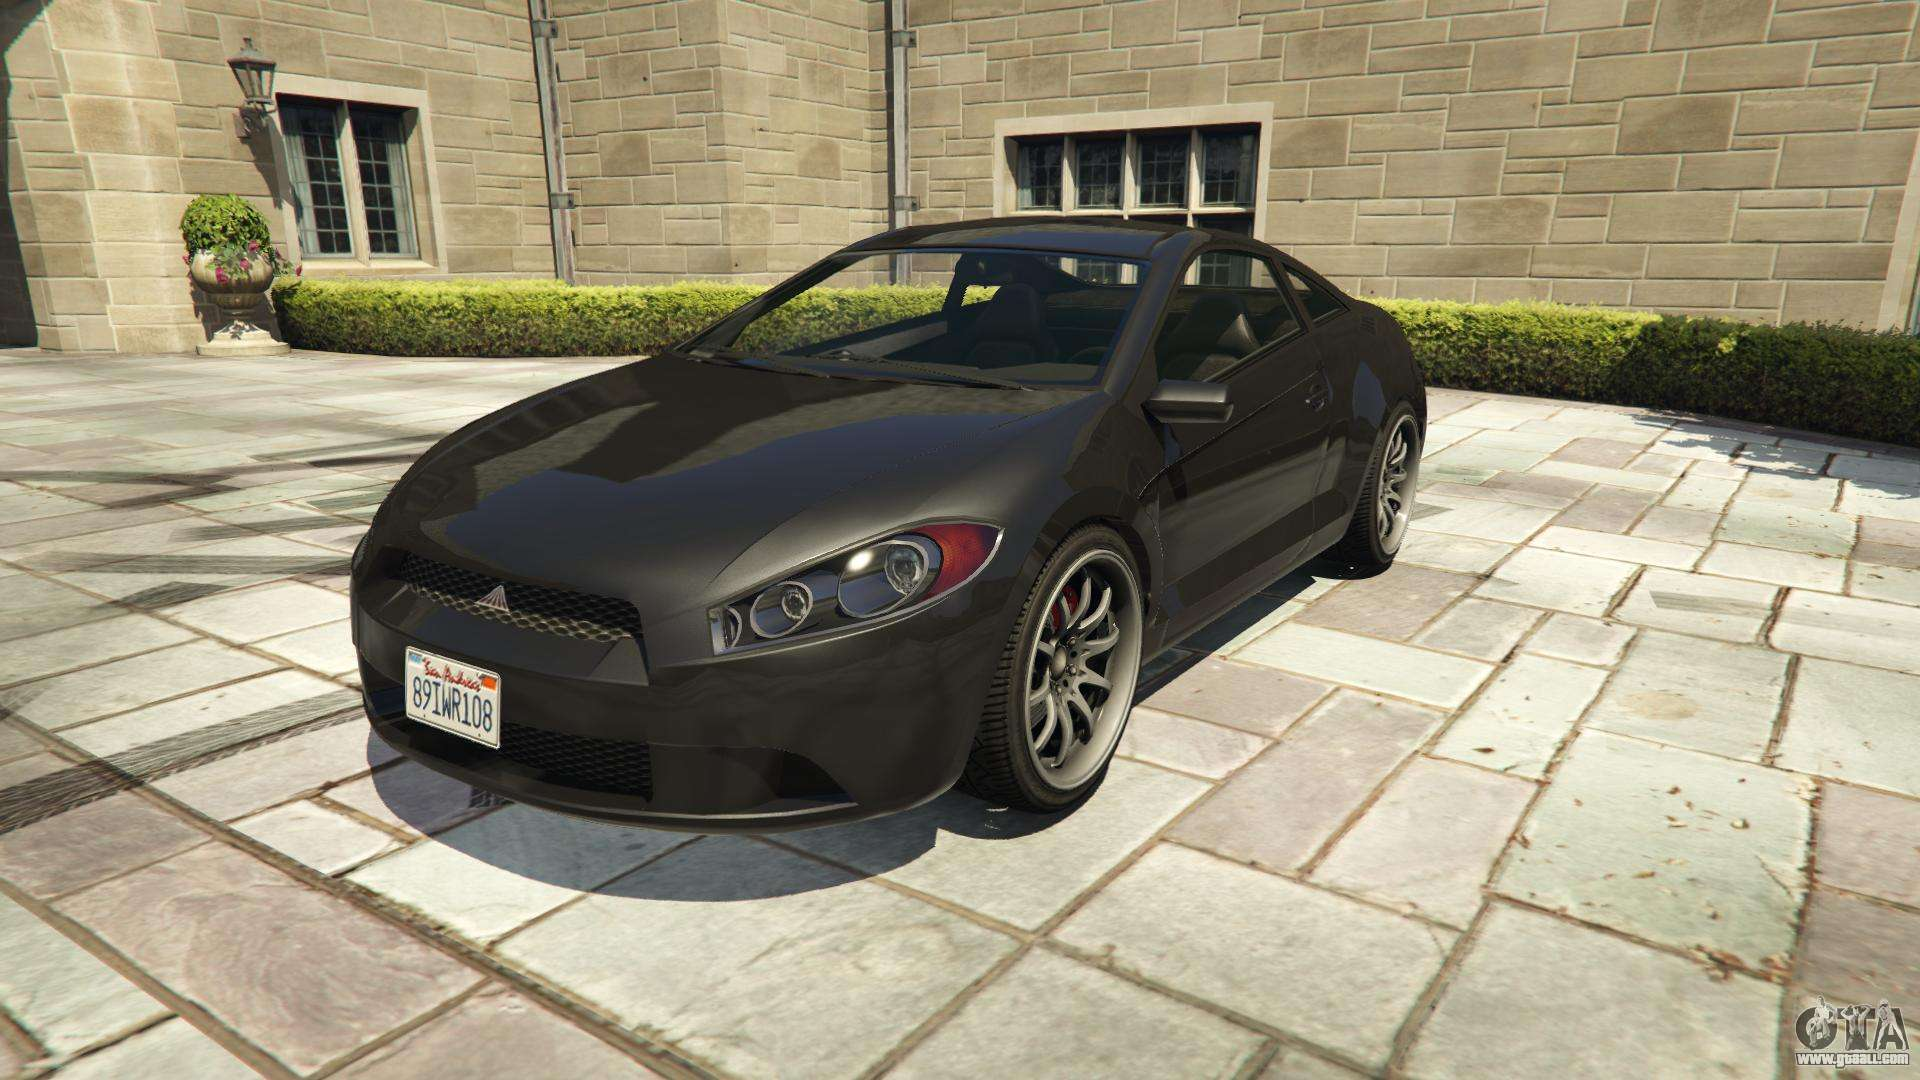 Maibatsu Penumbra GTA 5 - front view